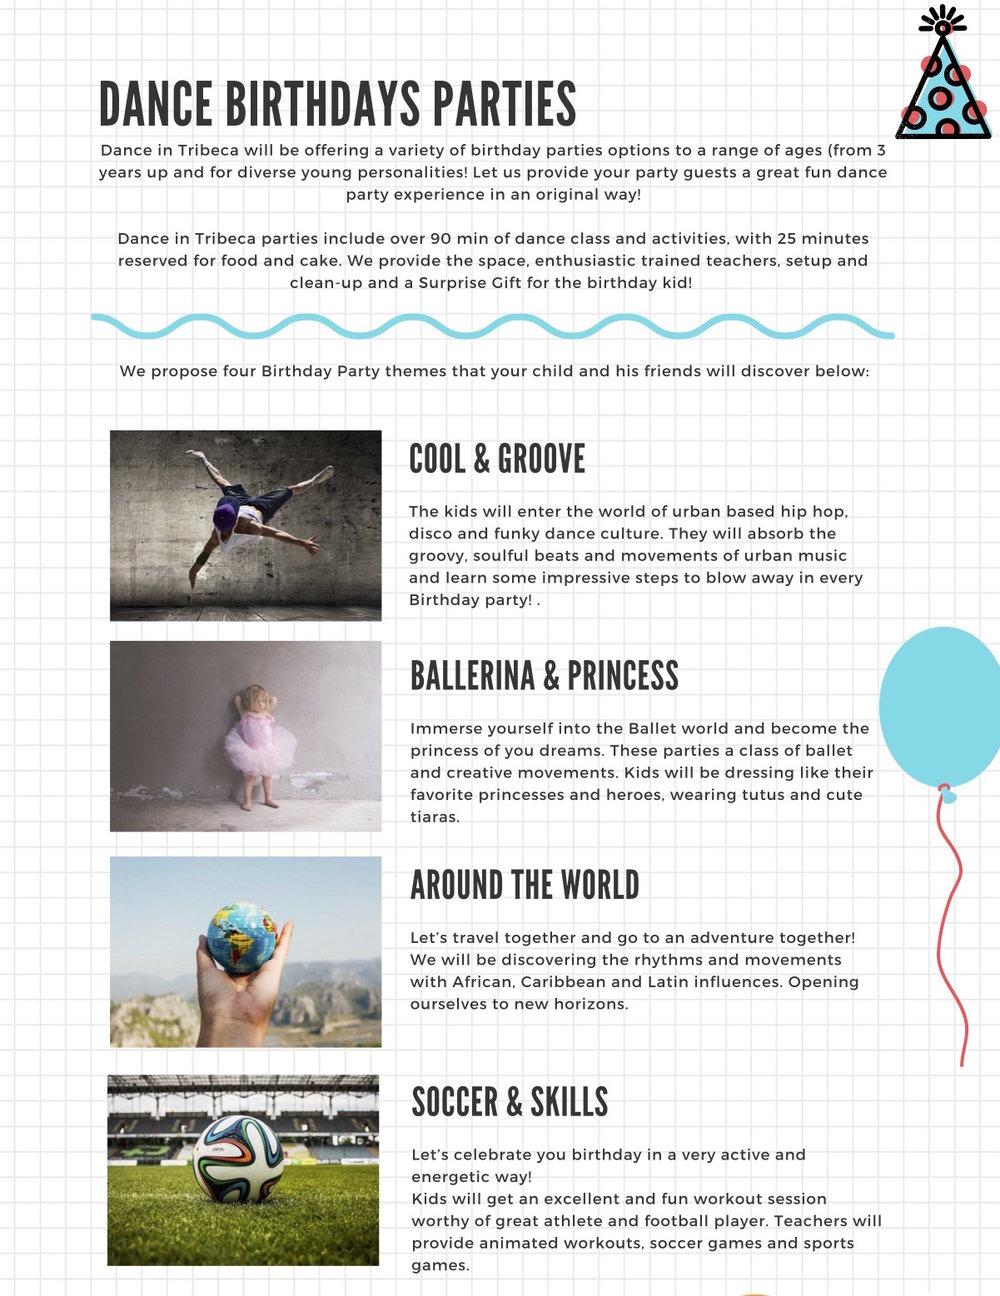 birthday parties layout.jpg